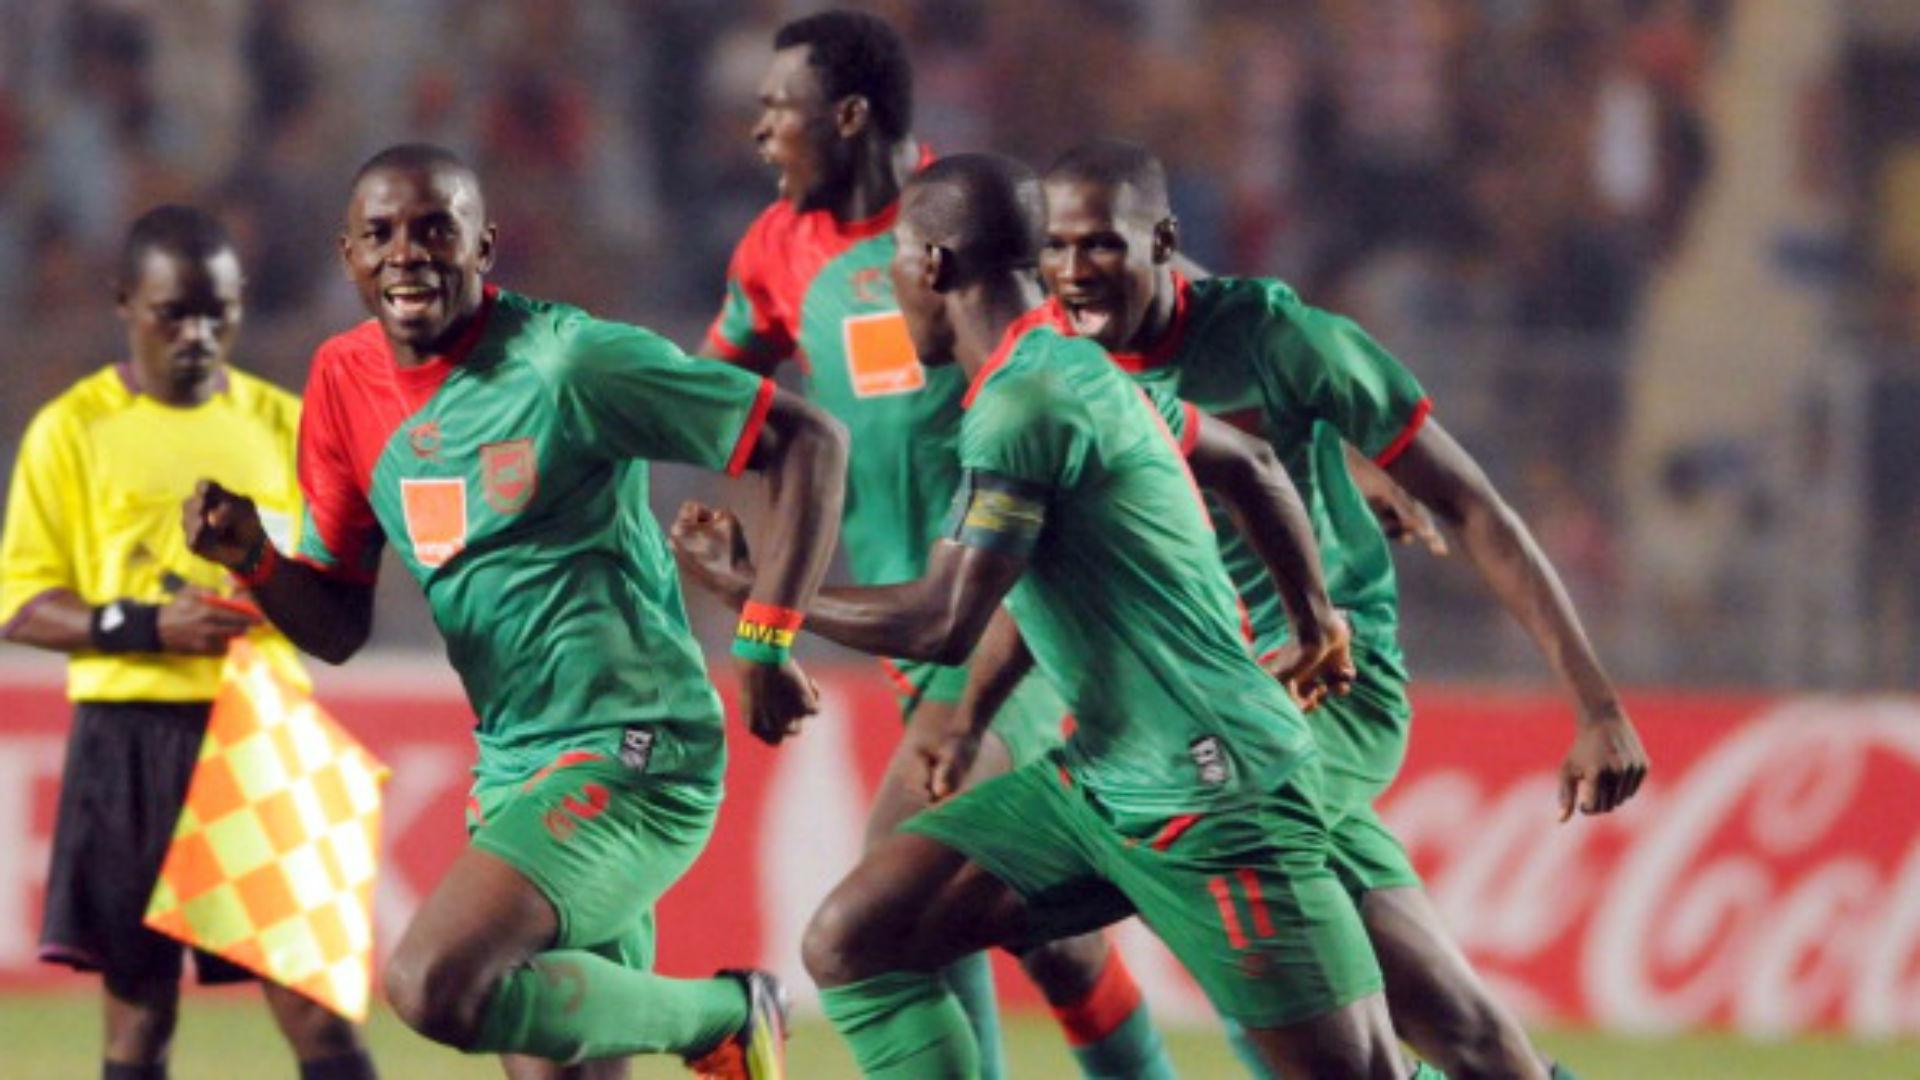 Malian Djoliba A C striker Alou Bagayoko (L) celebrates with teammates